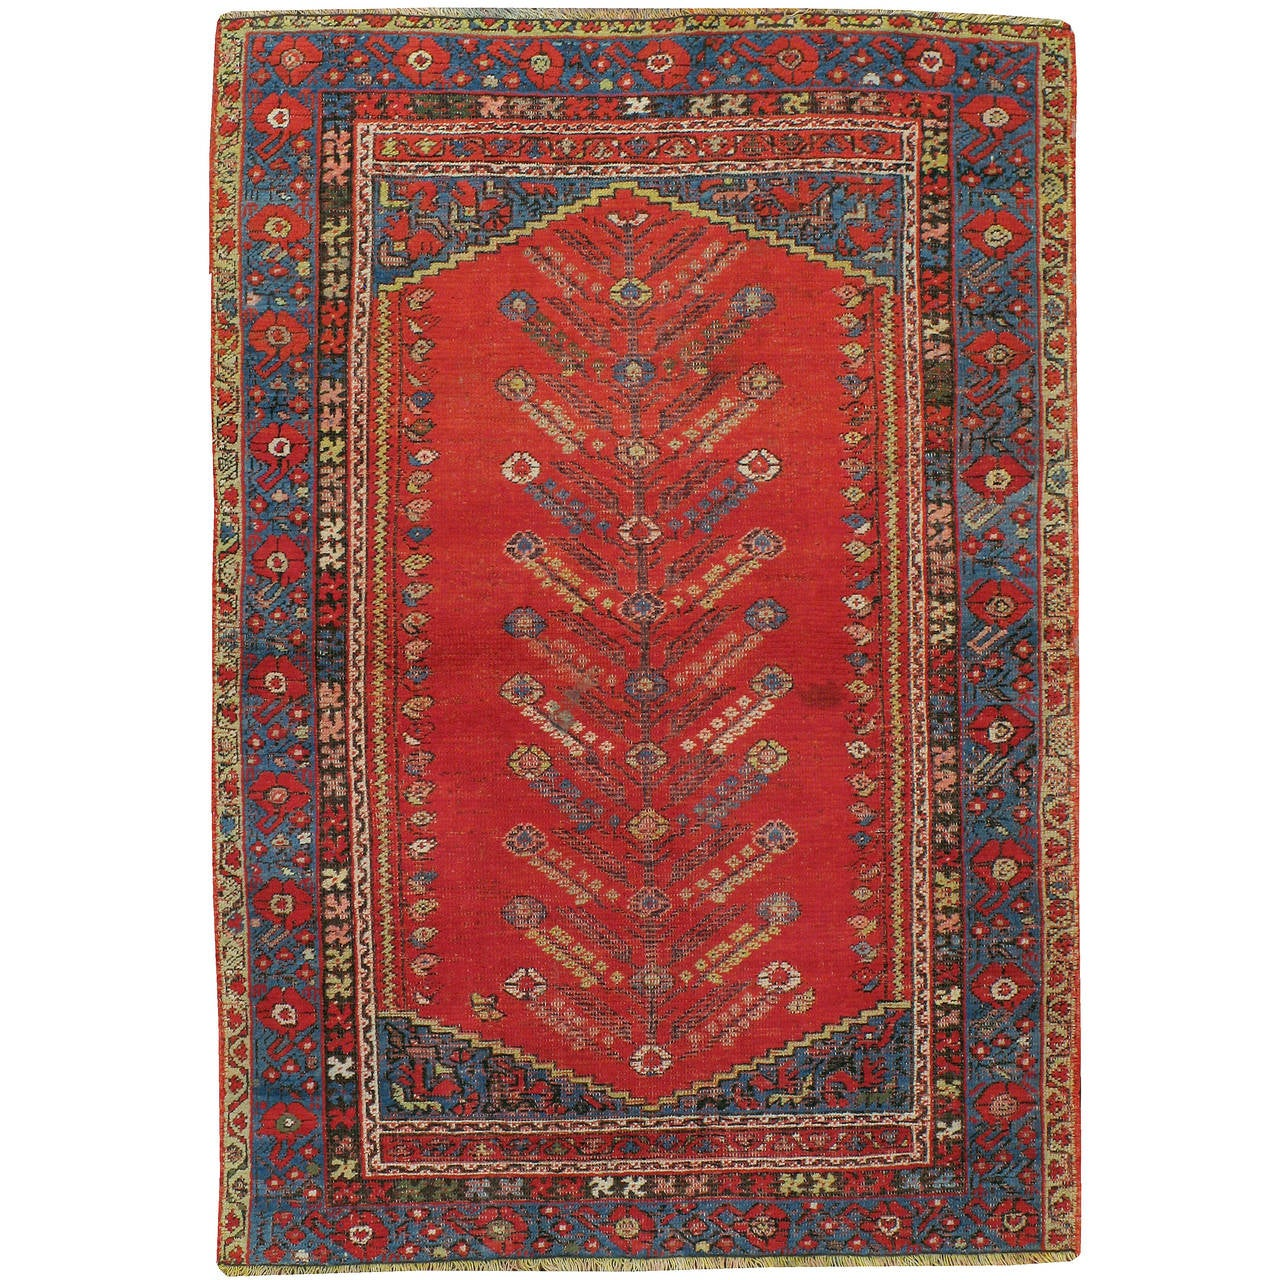 Antique Turkish Kula Rug